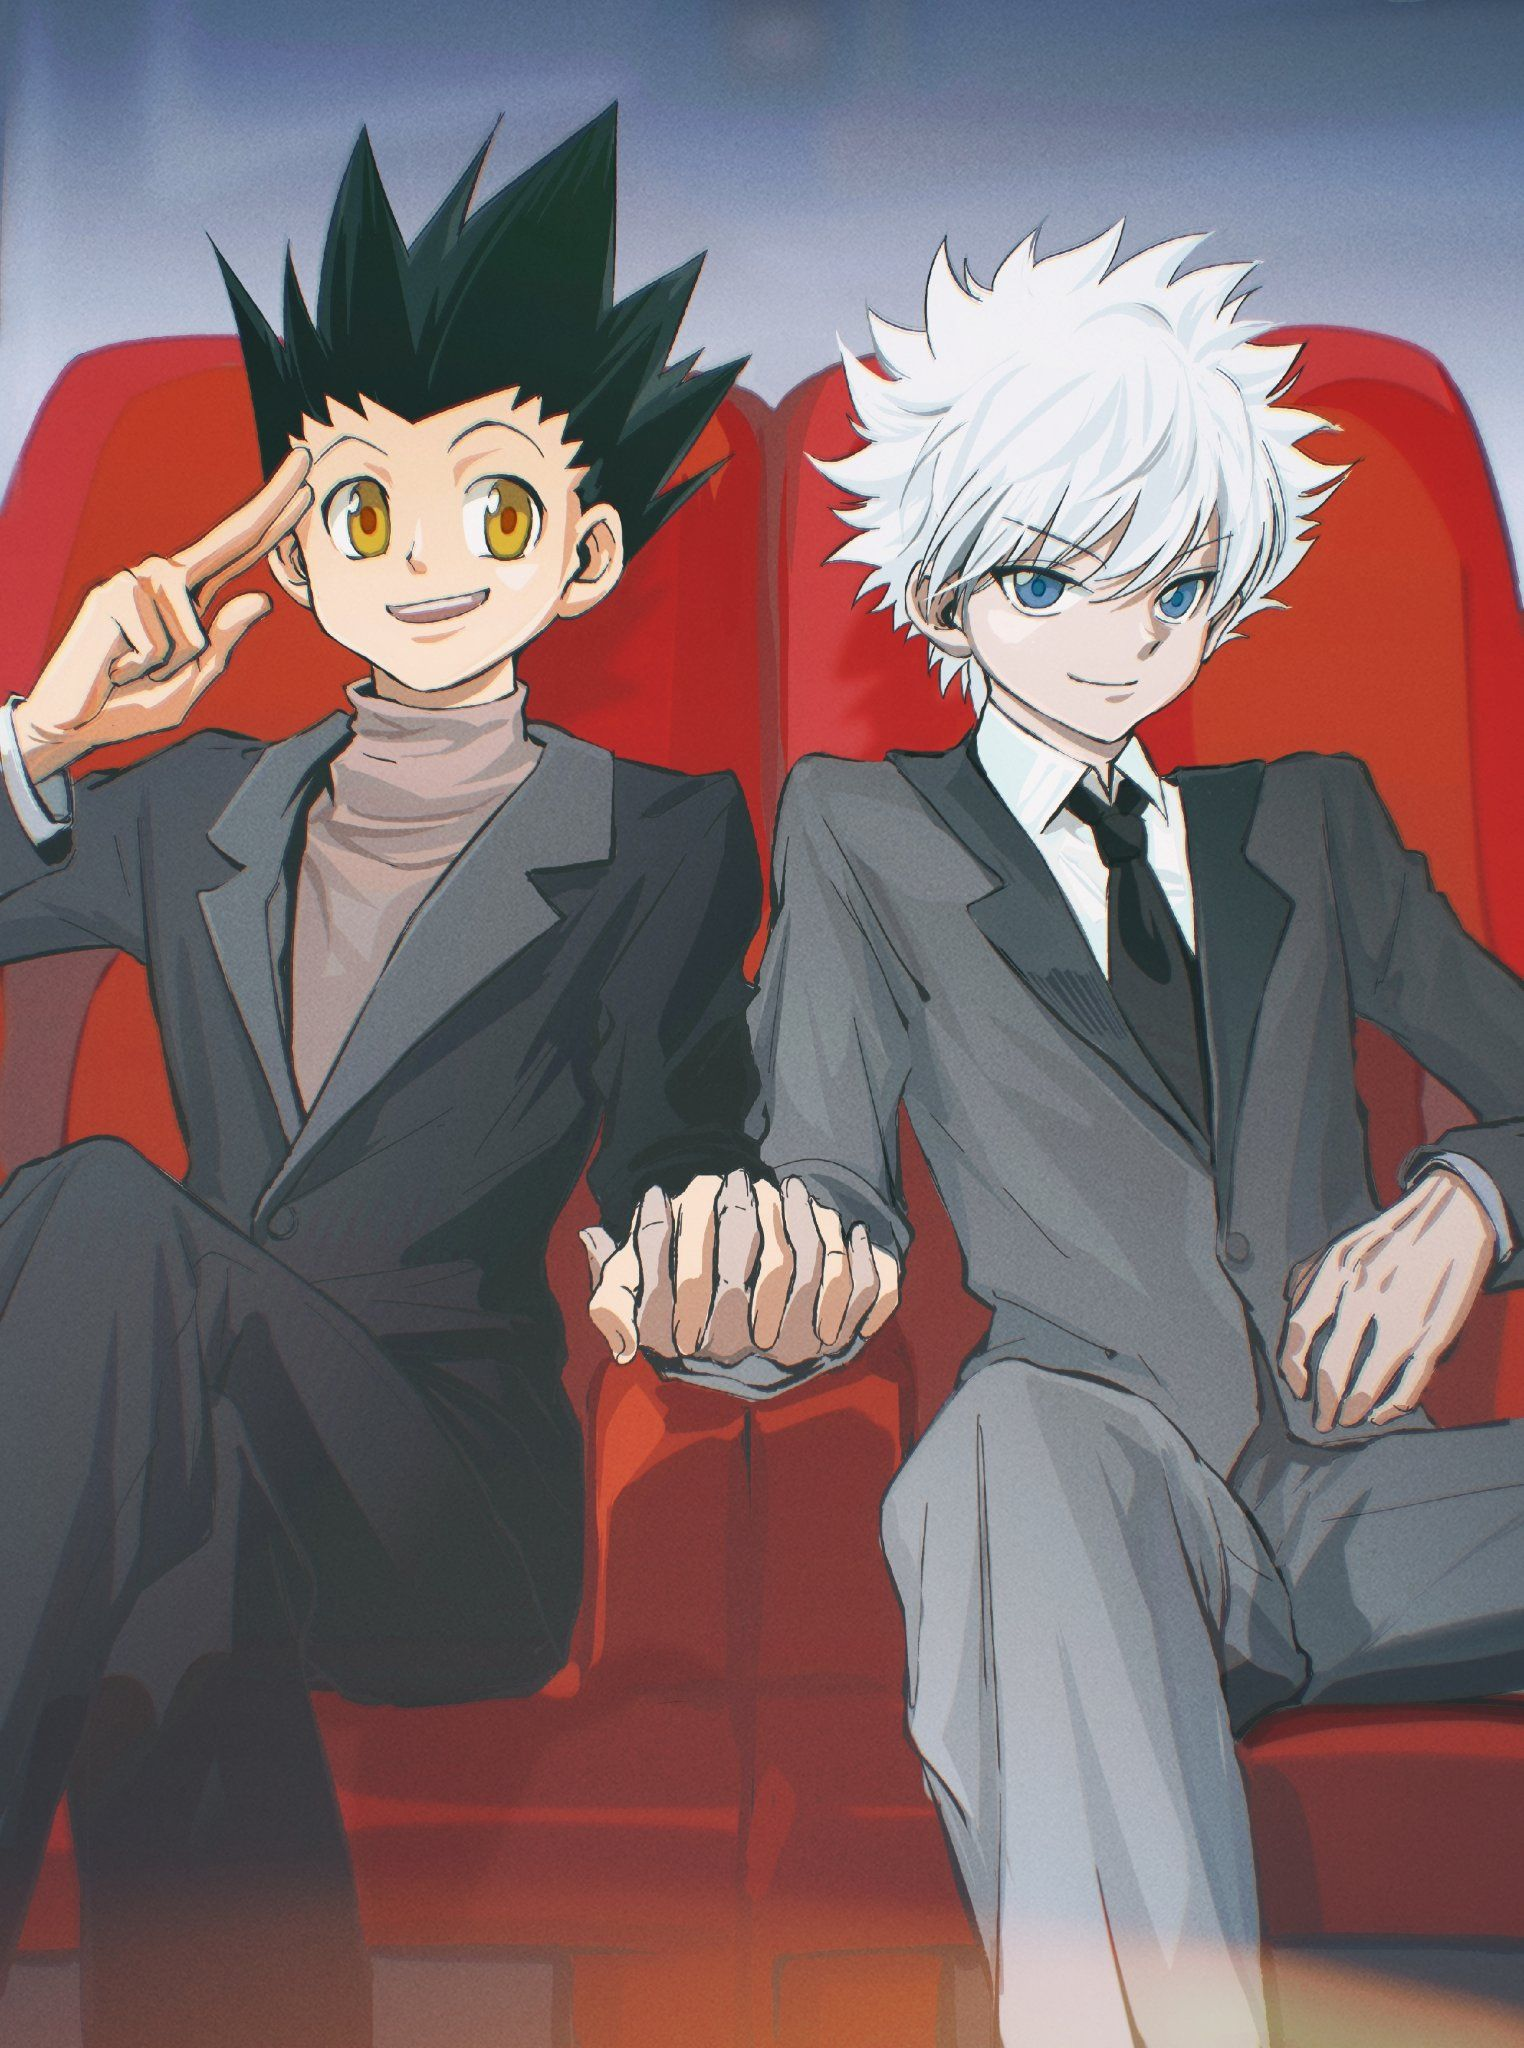 Pin By Ireneesdla On Hxh In 2020 Hunter Anime Hunter X Hunter Anime Guys